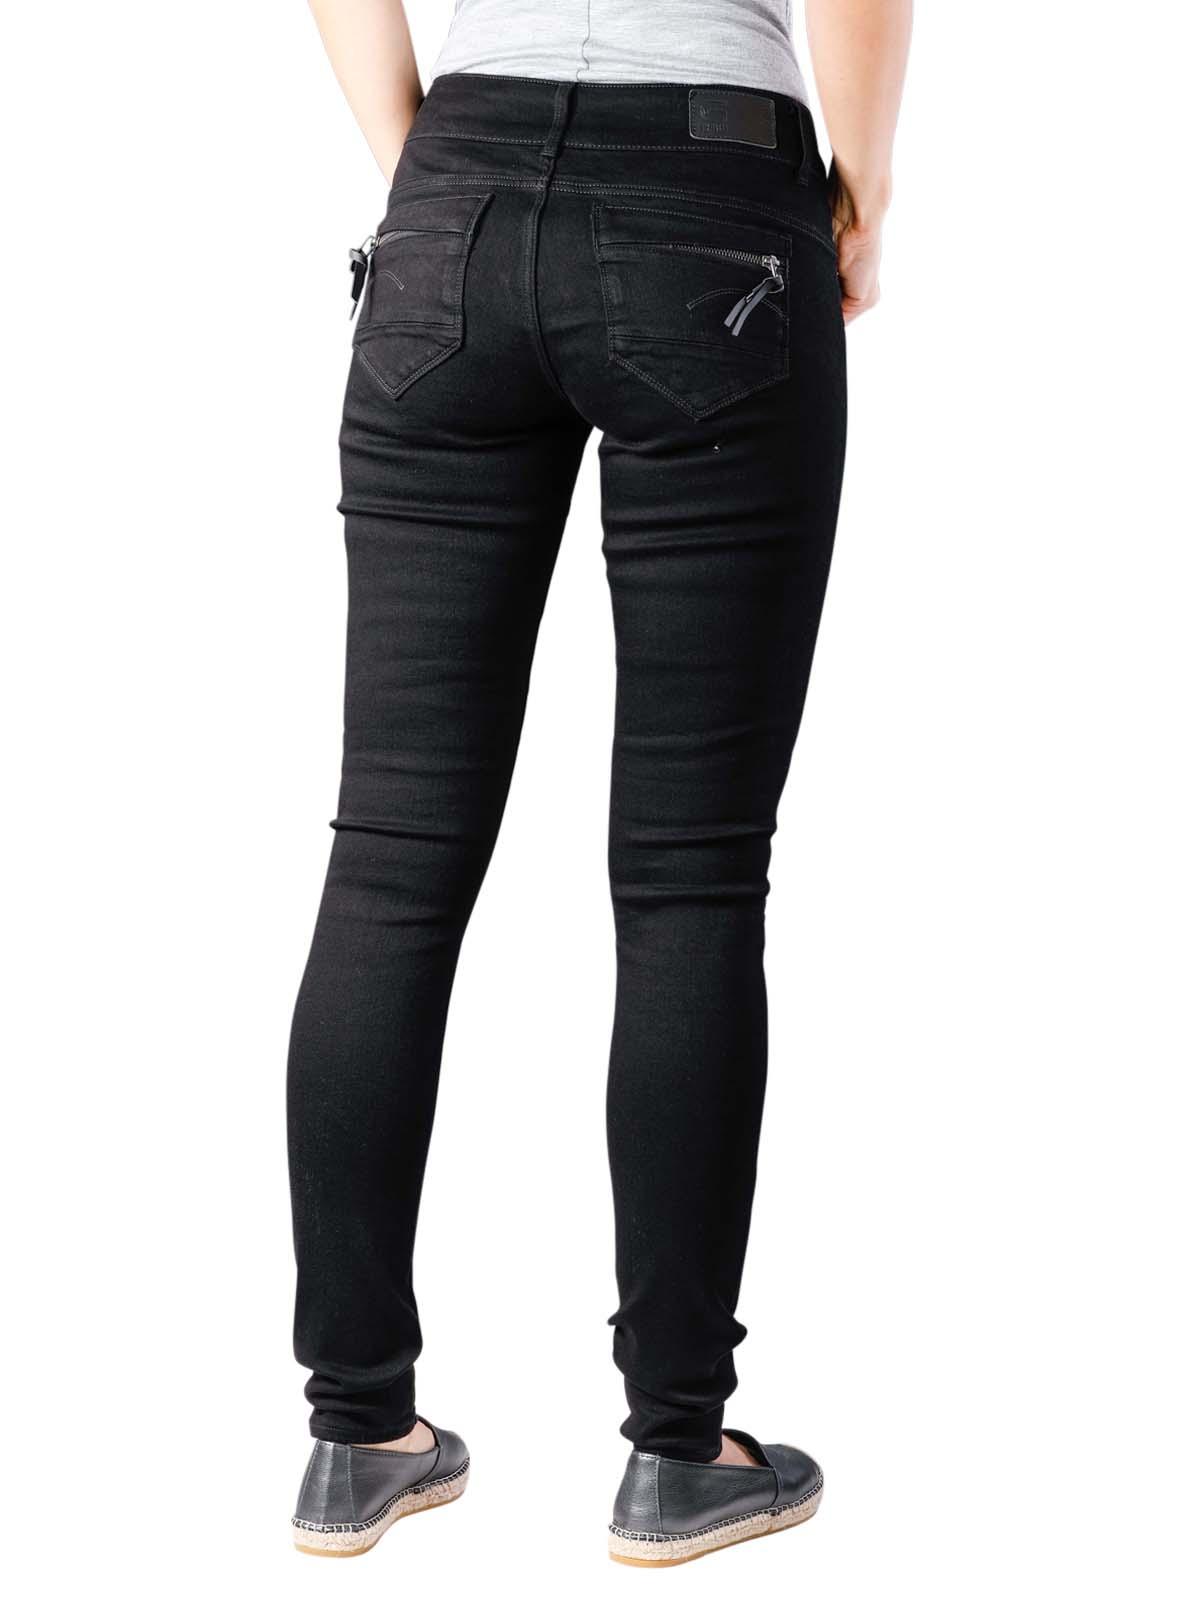 W33 L34 Medium Aged G-Star Midge Cody Skinny WMN Jeans